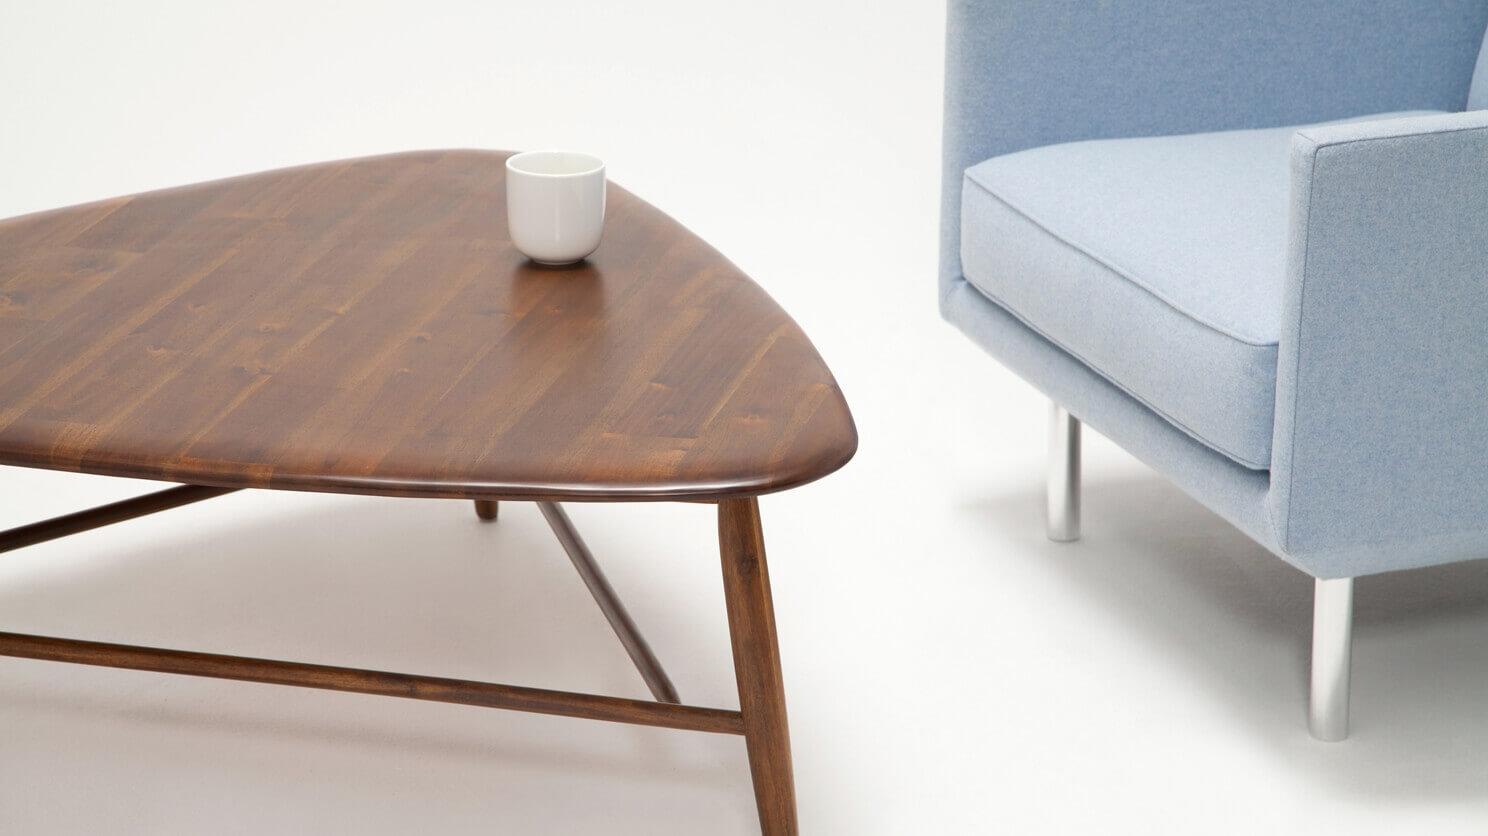 Kacia Tri Coffee Table Modern Rustic Coffee Table Eq3 [ 836 x 1488 Pixel ]